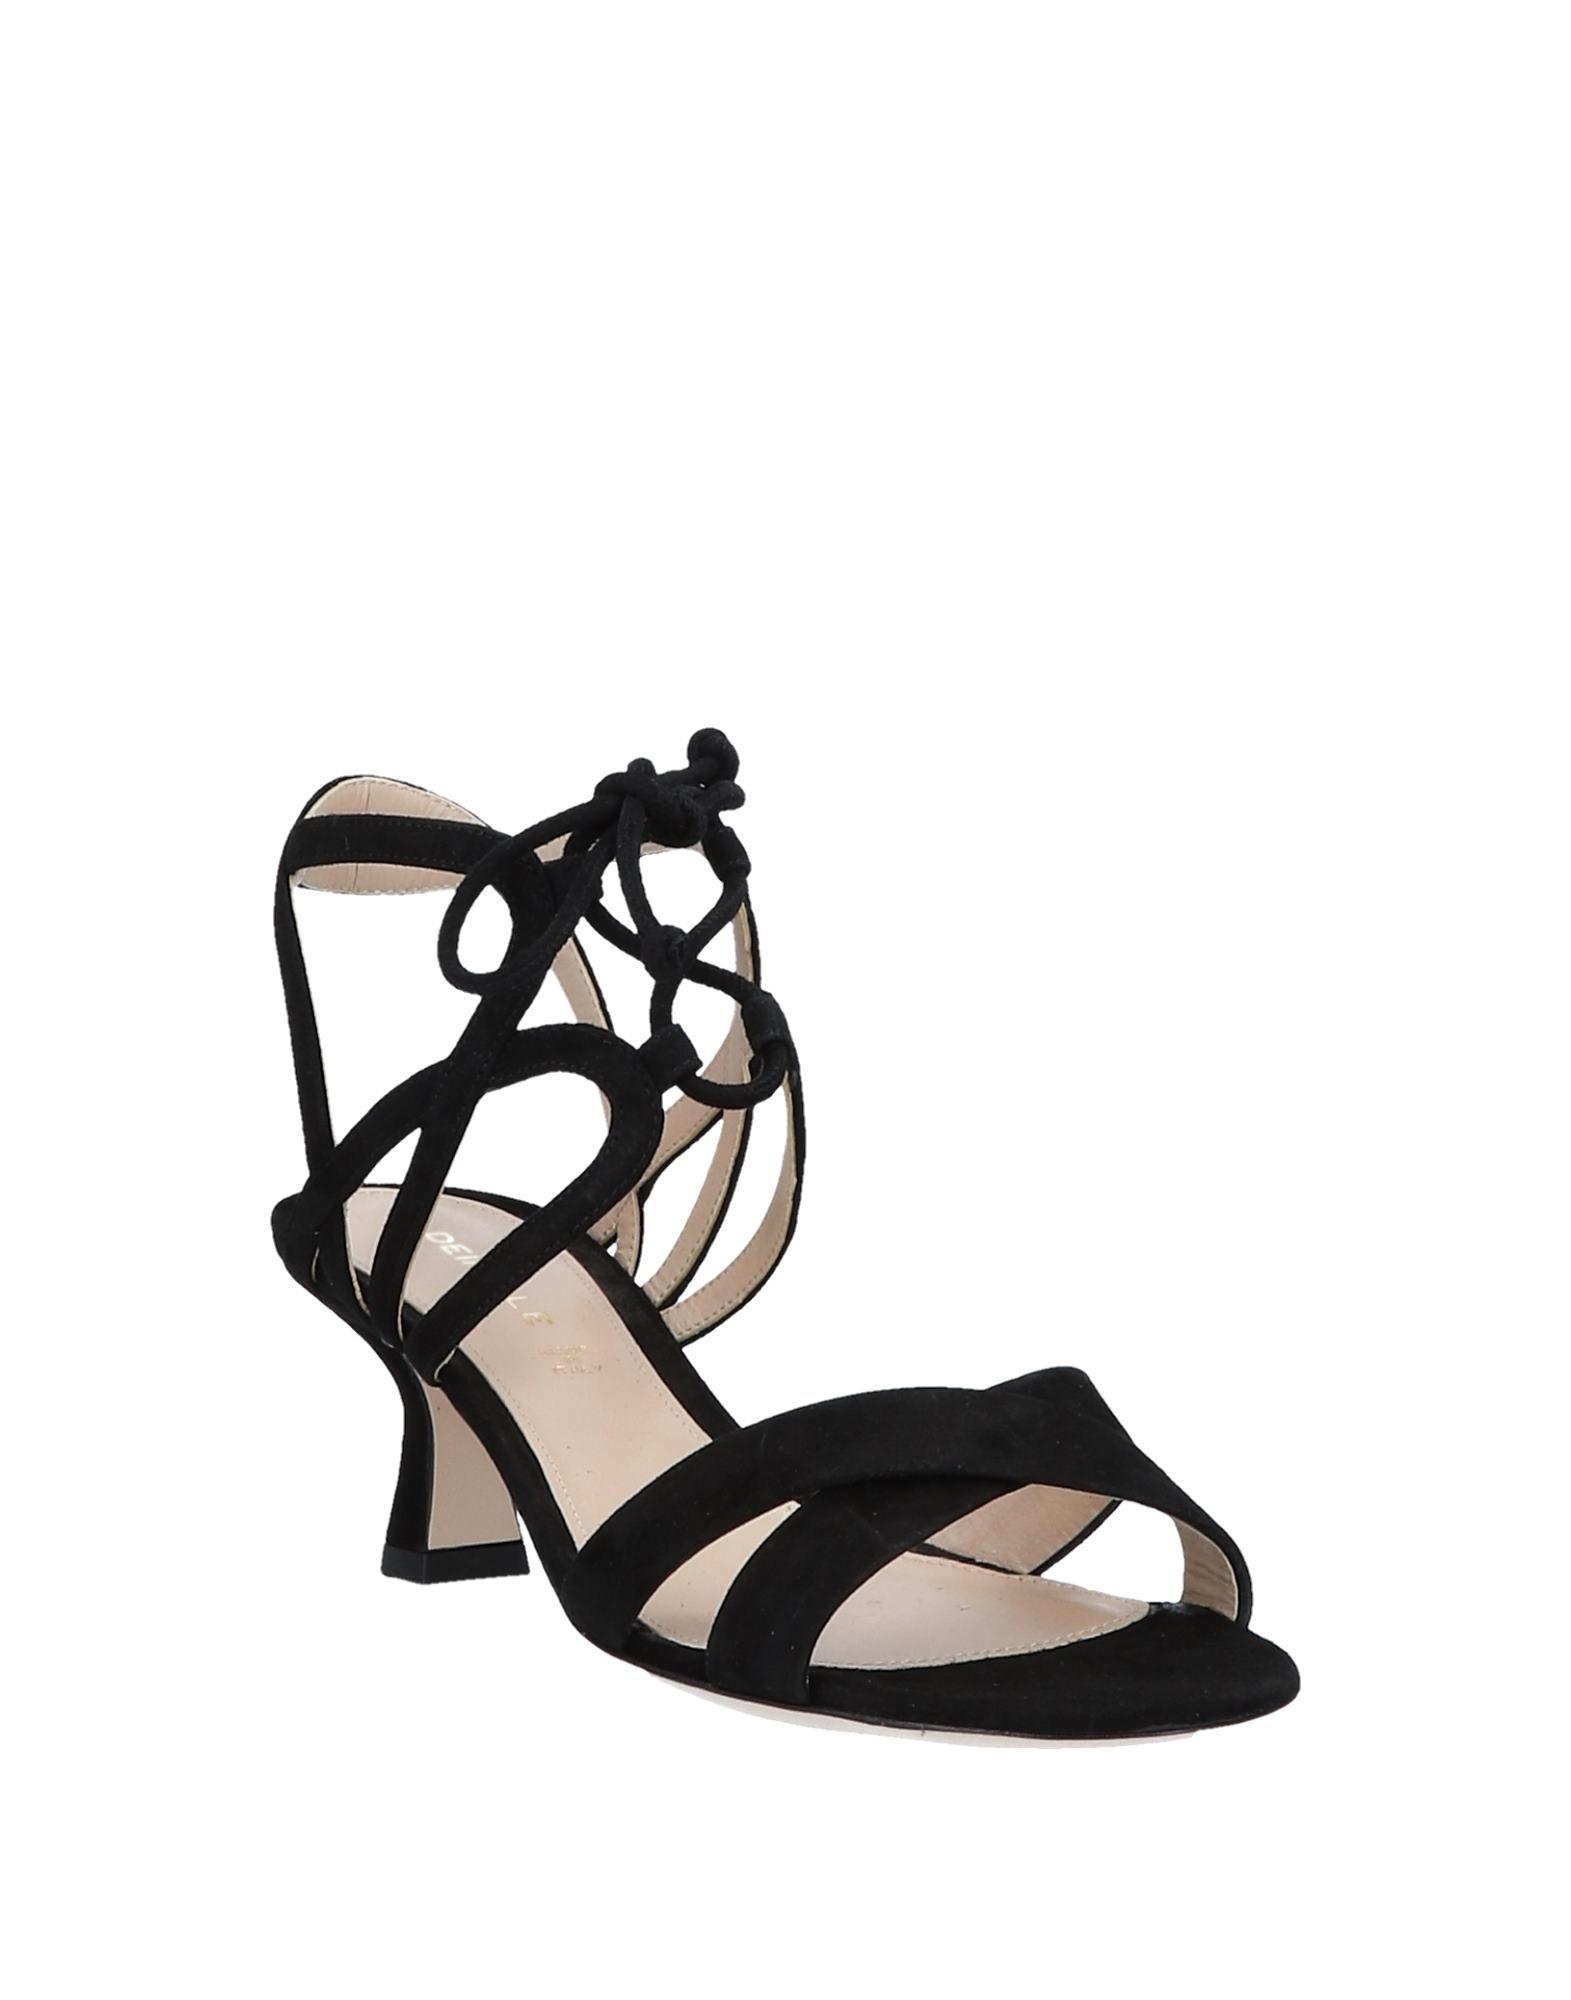 Stilvolle billige Schuhe Damen Deimille Sandalen Damen Schuhe  11562070DF 8cadf6